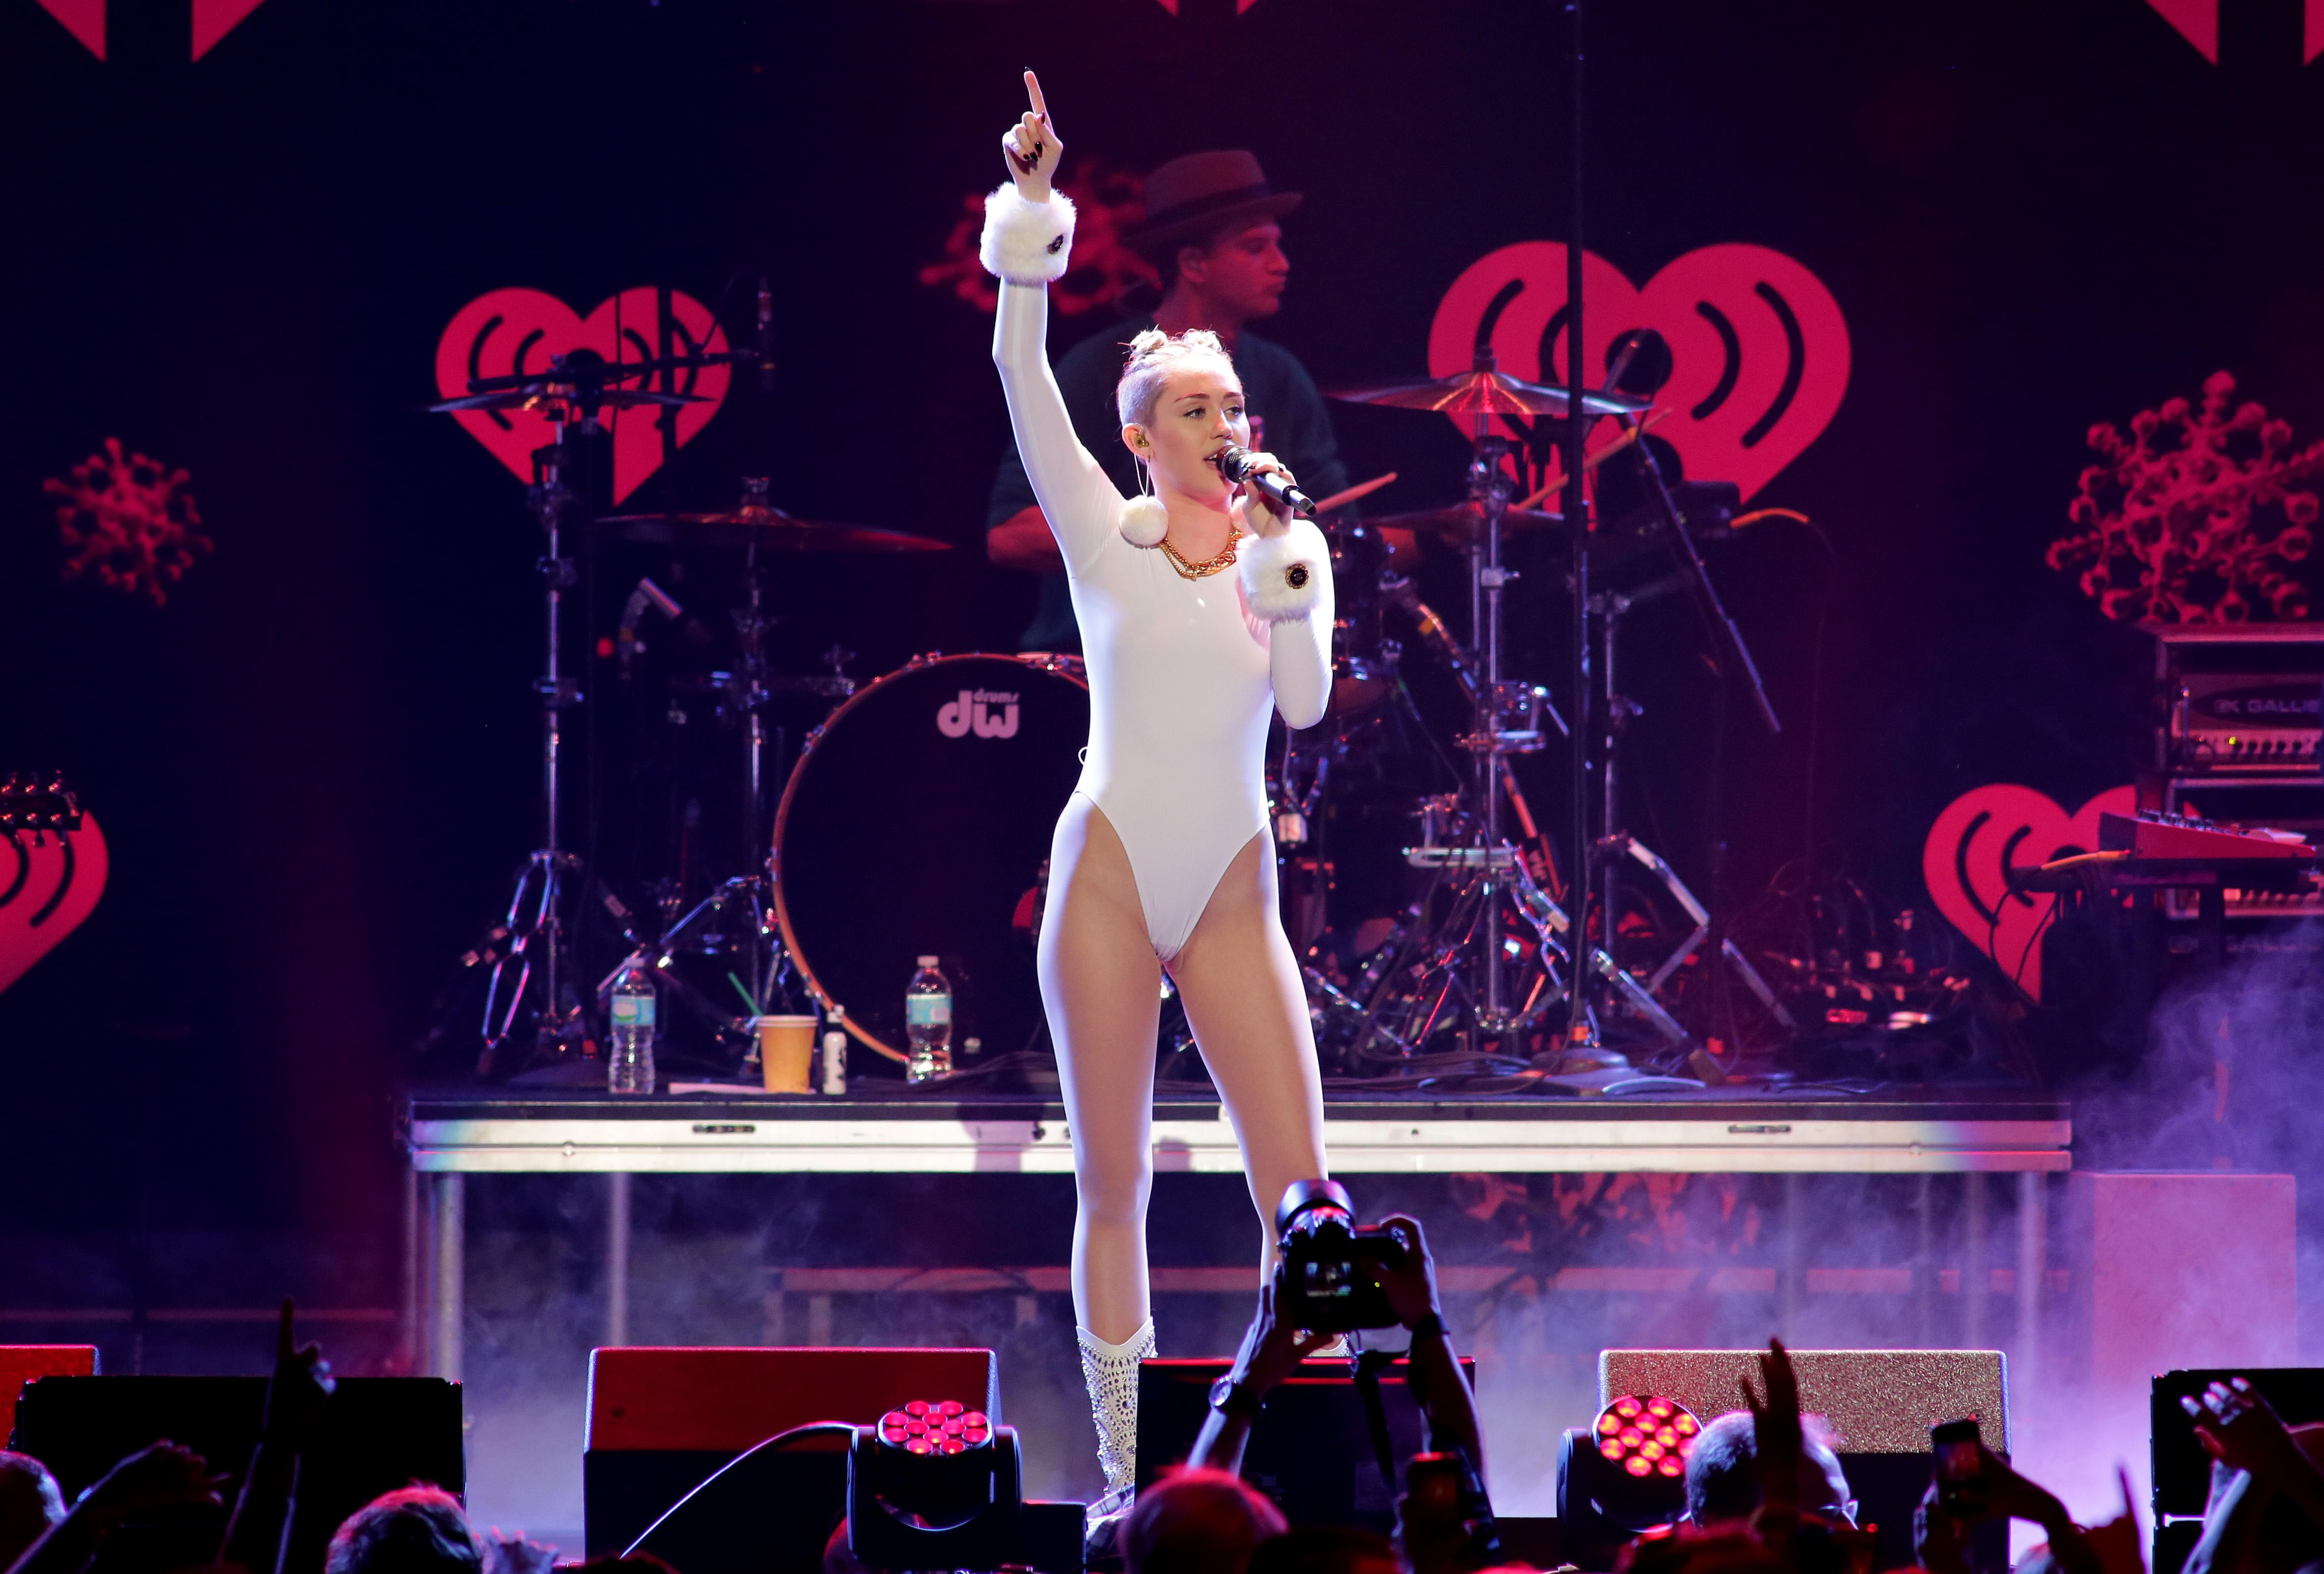 Miley Cyrus shares photos of vegan wedding to Liam